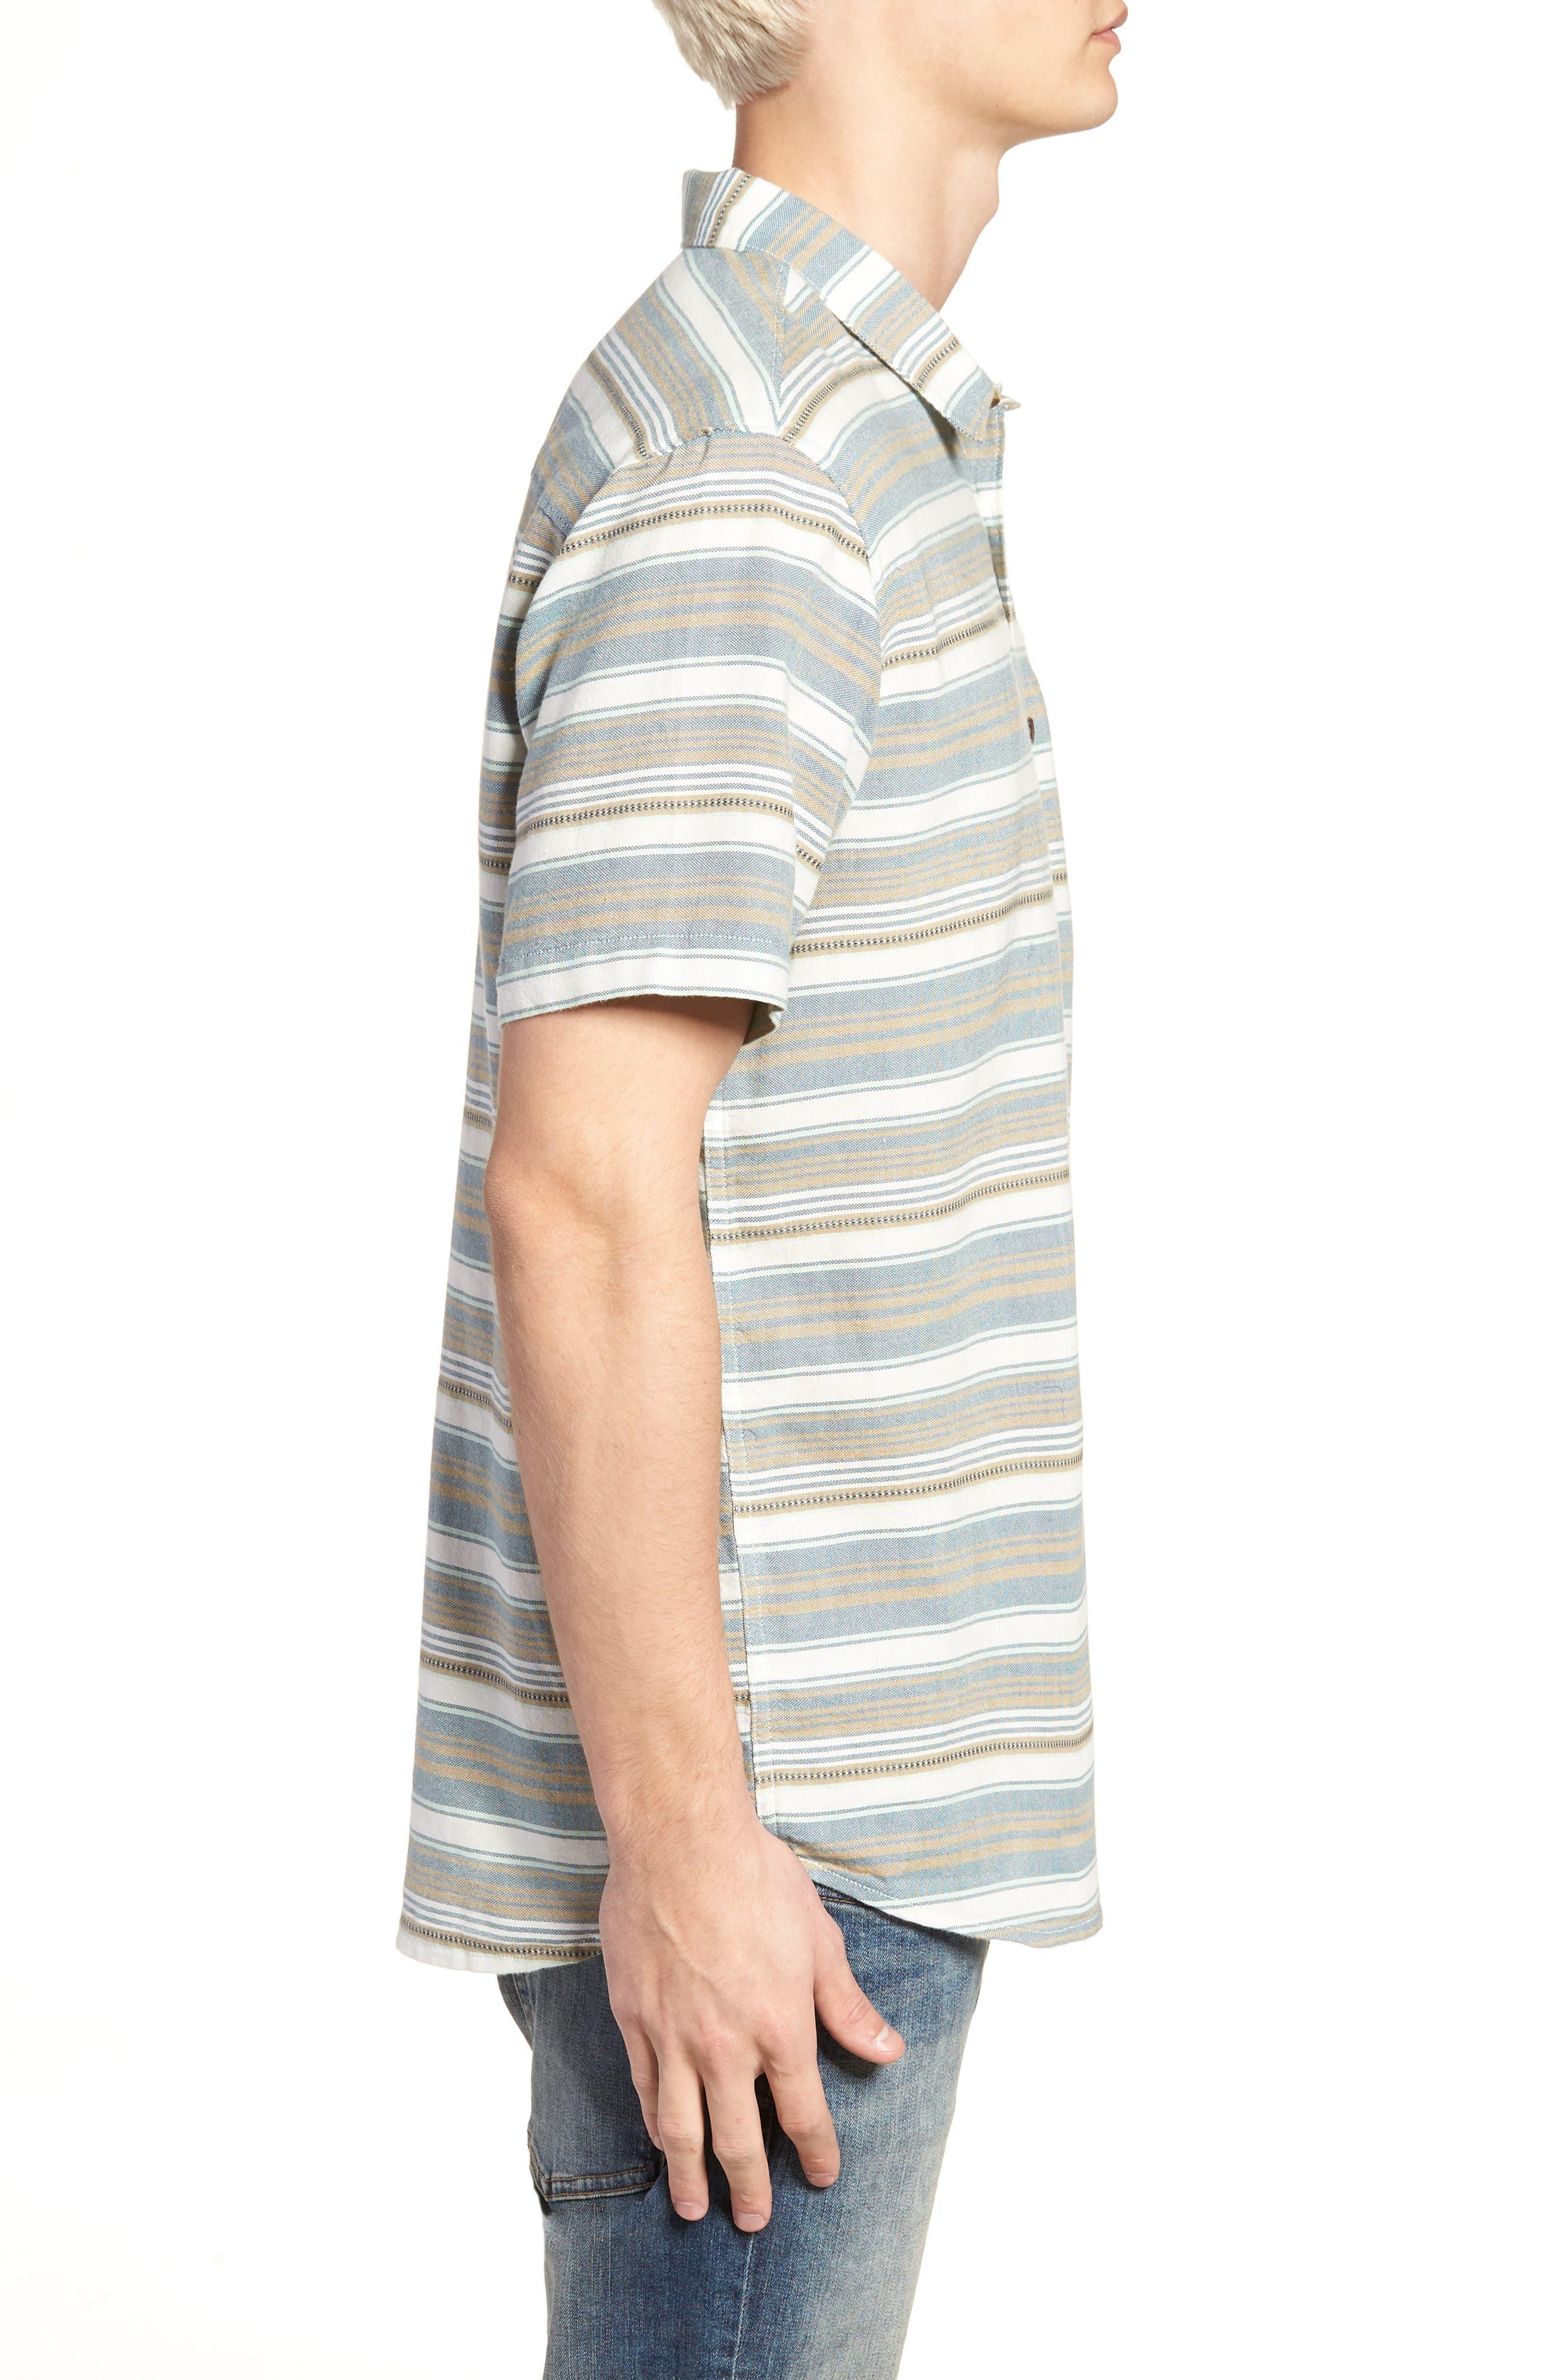 Currington Short Sleeve Shirt,                             Alternate thumbnail 3, color,                             Khaki